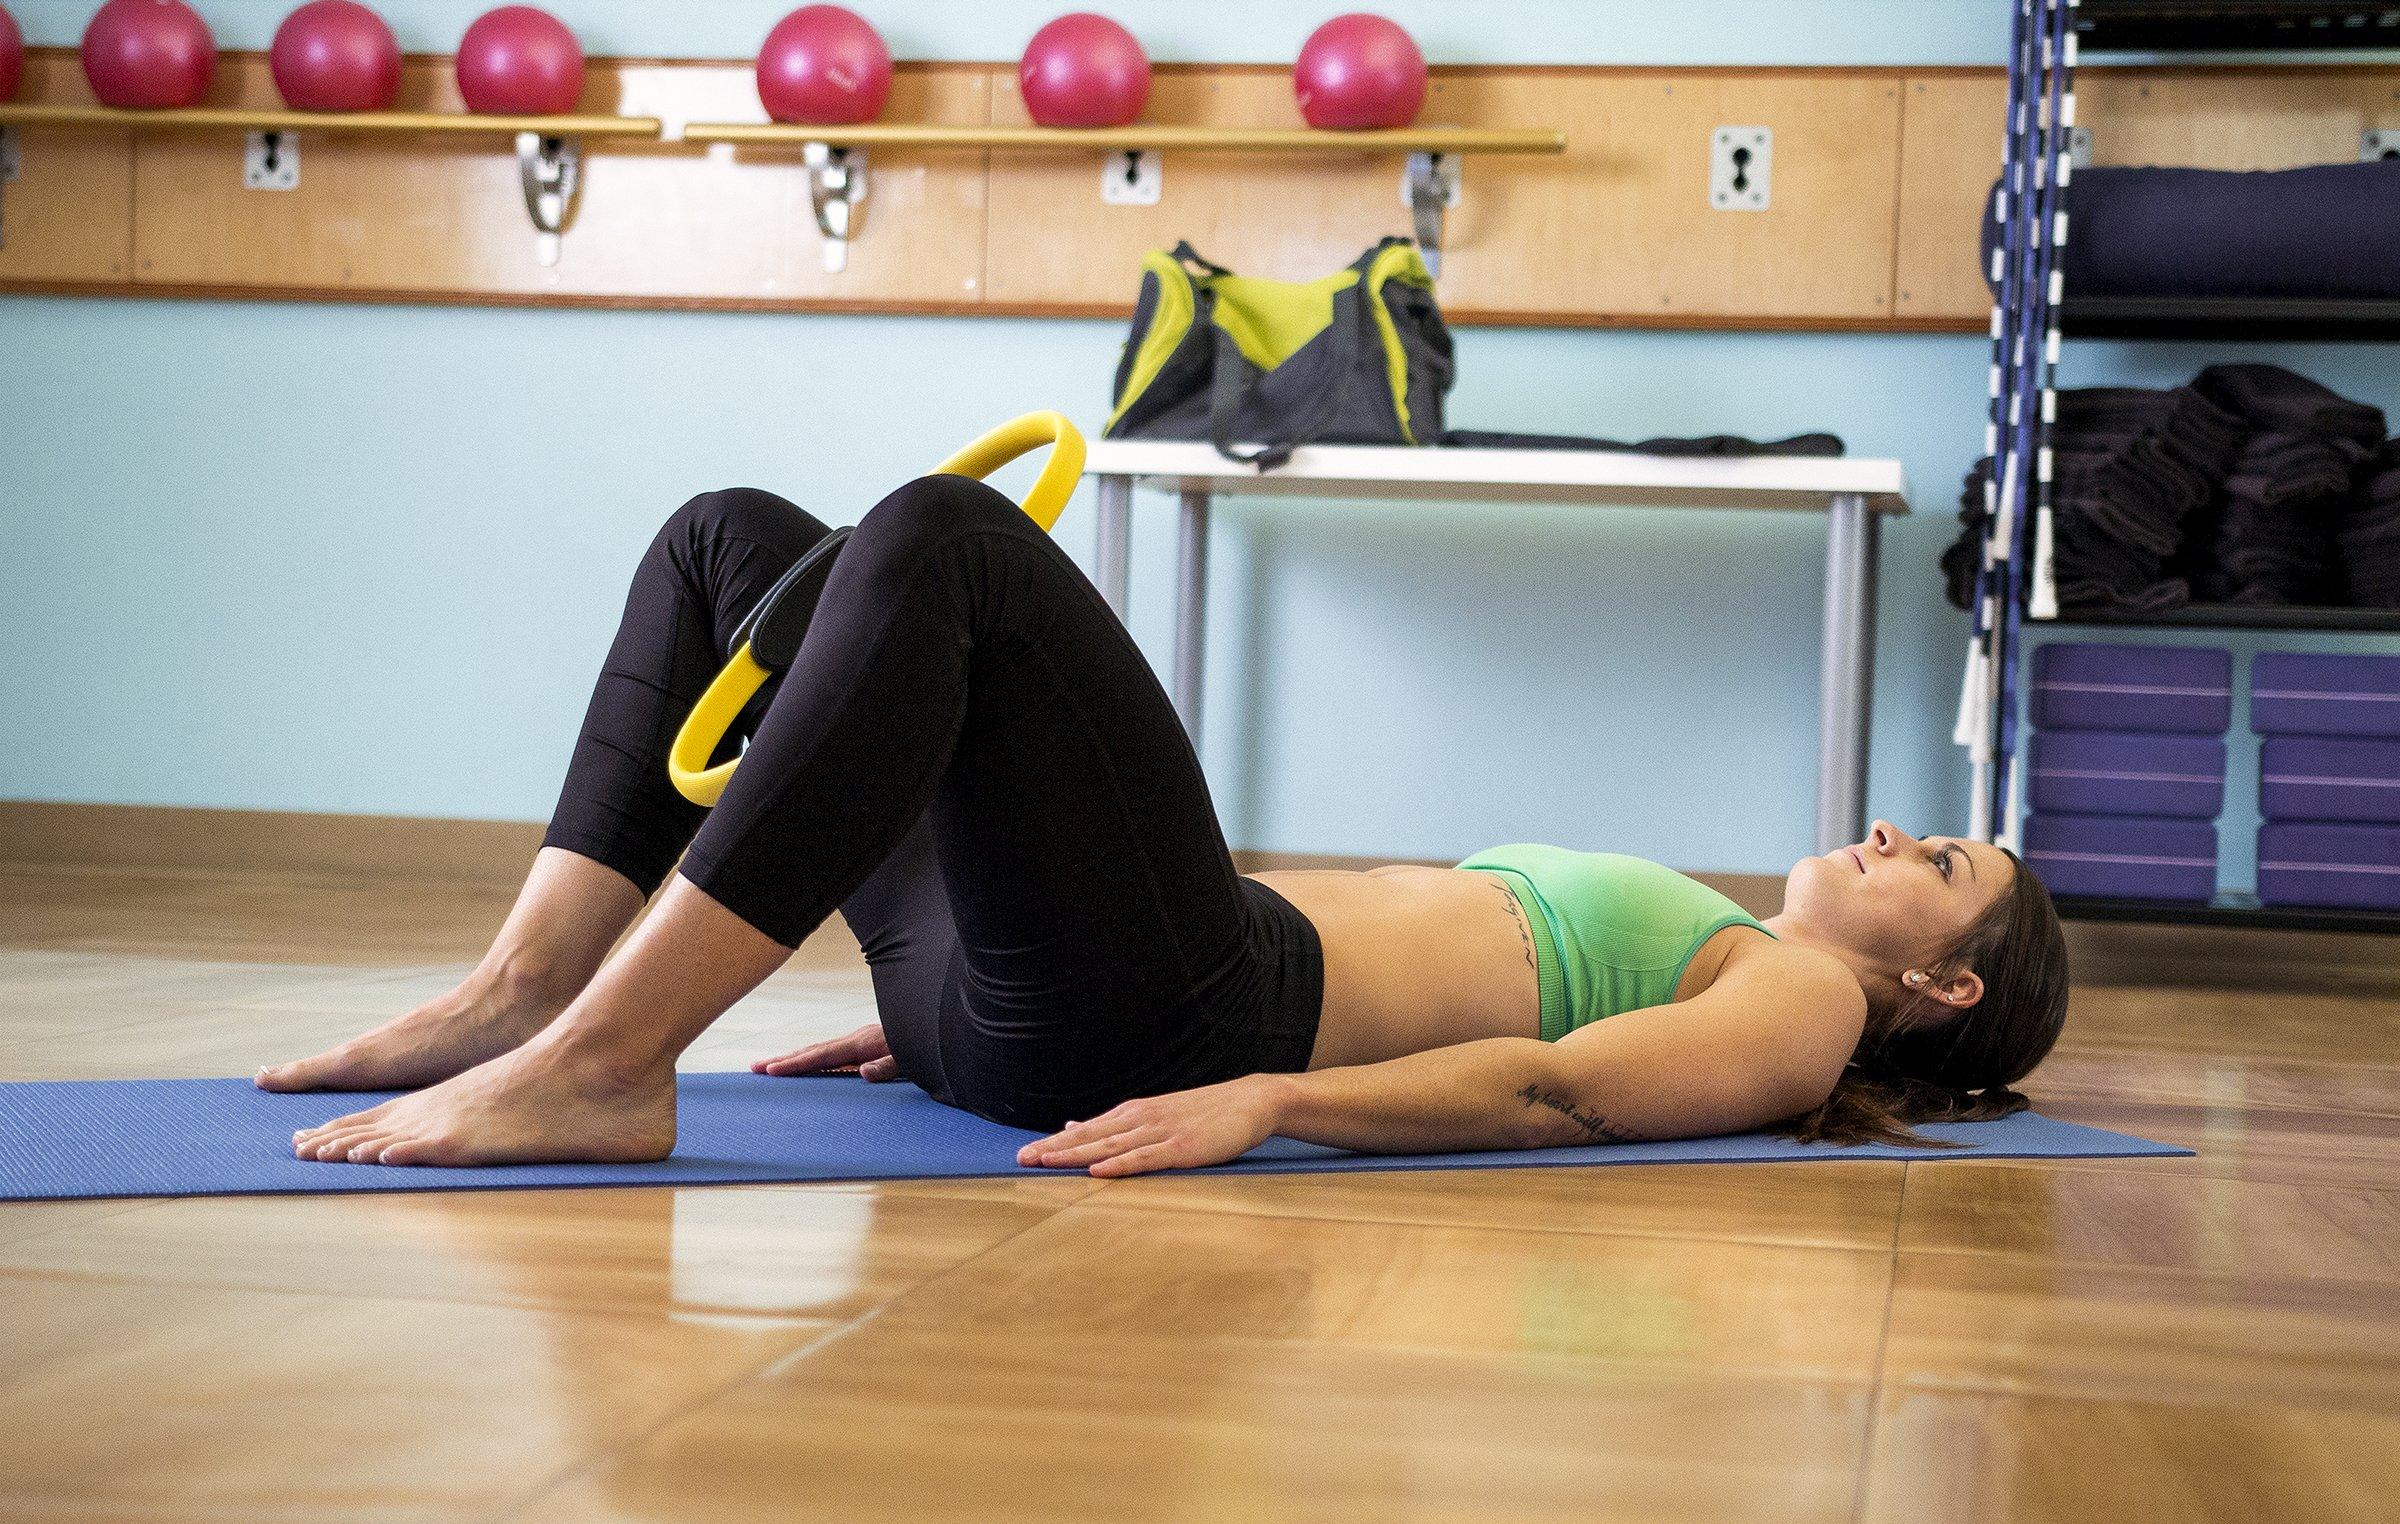 Pilates Ring Premium Power Resistance Full Body Toning Fitness Circle Durable